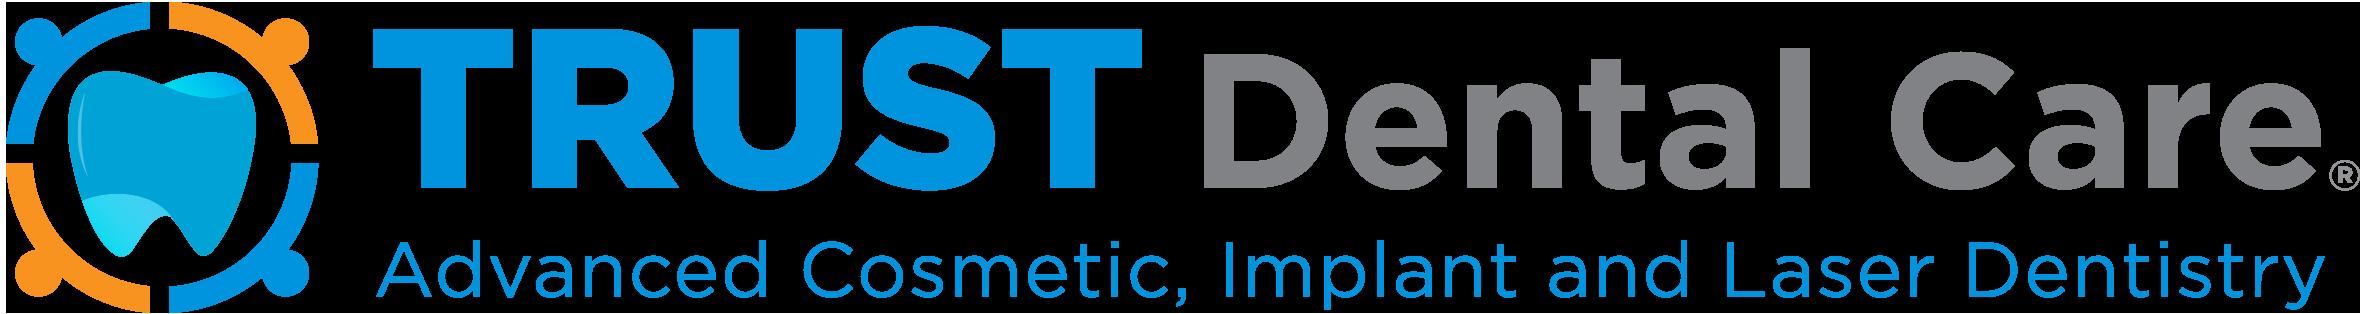 Trust Dental care Logo